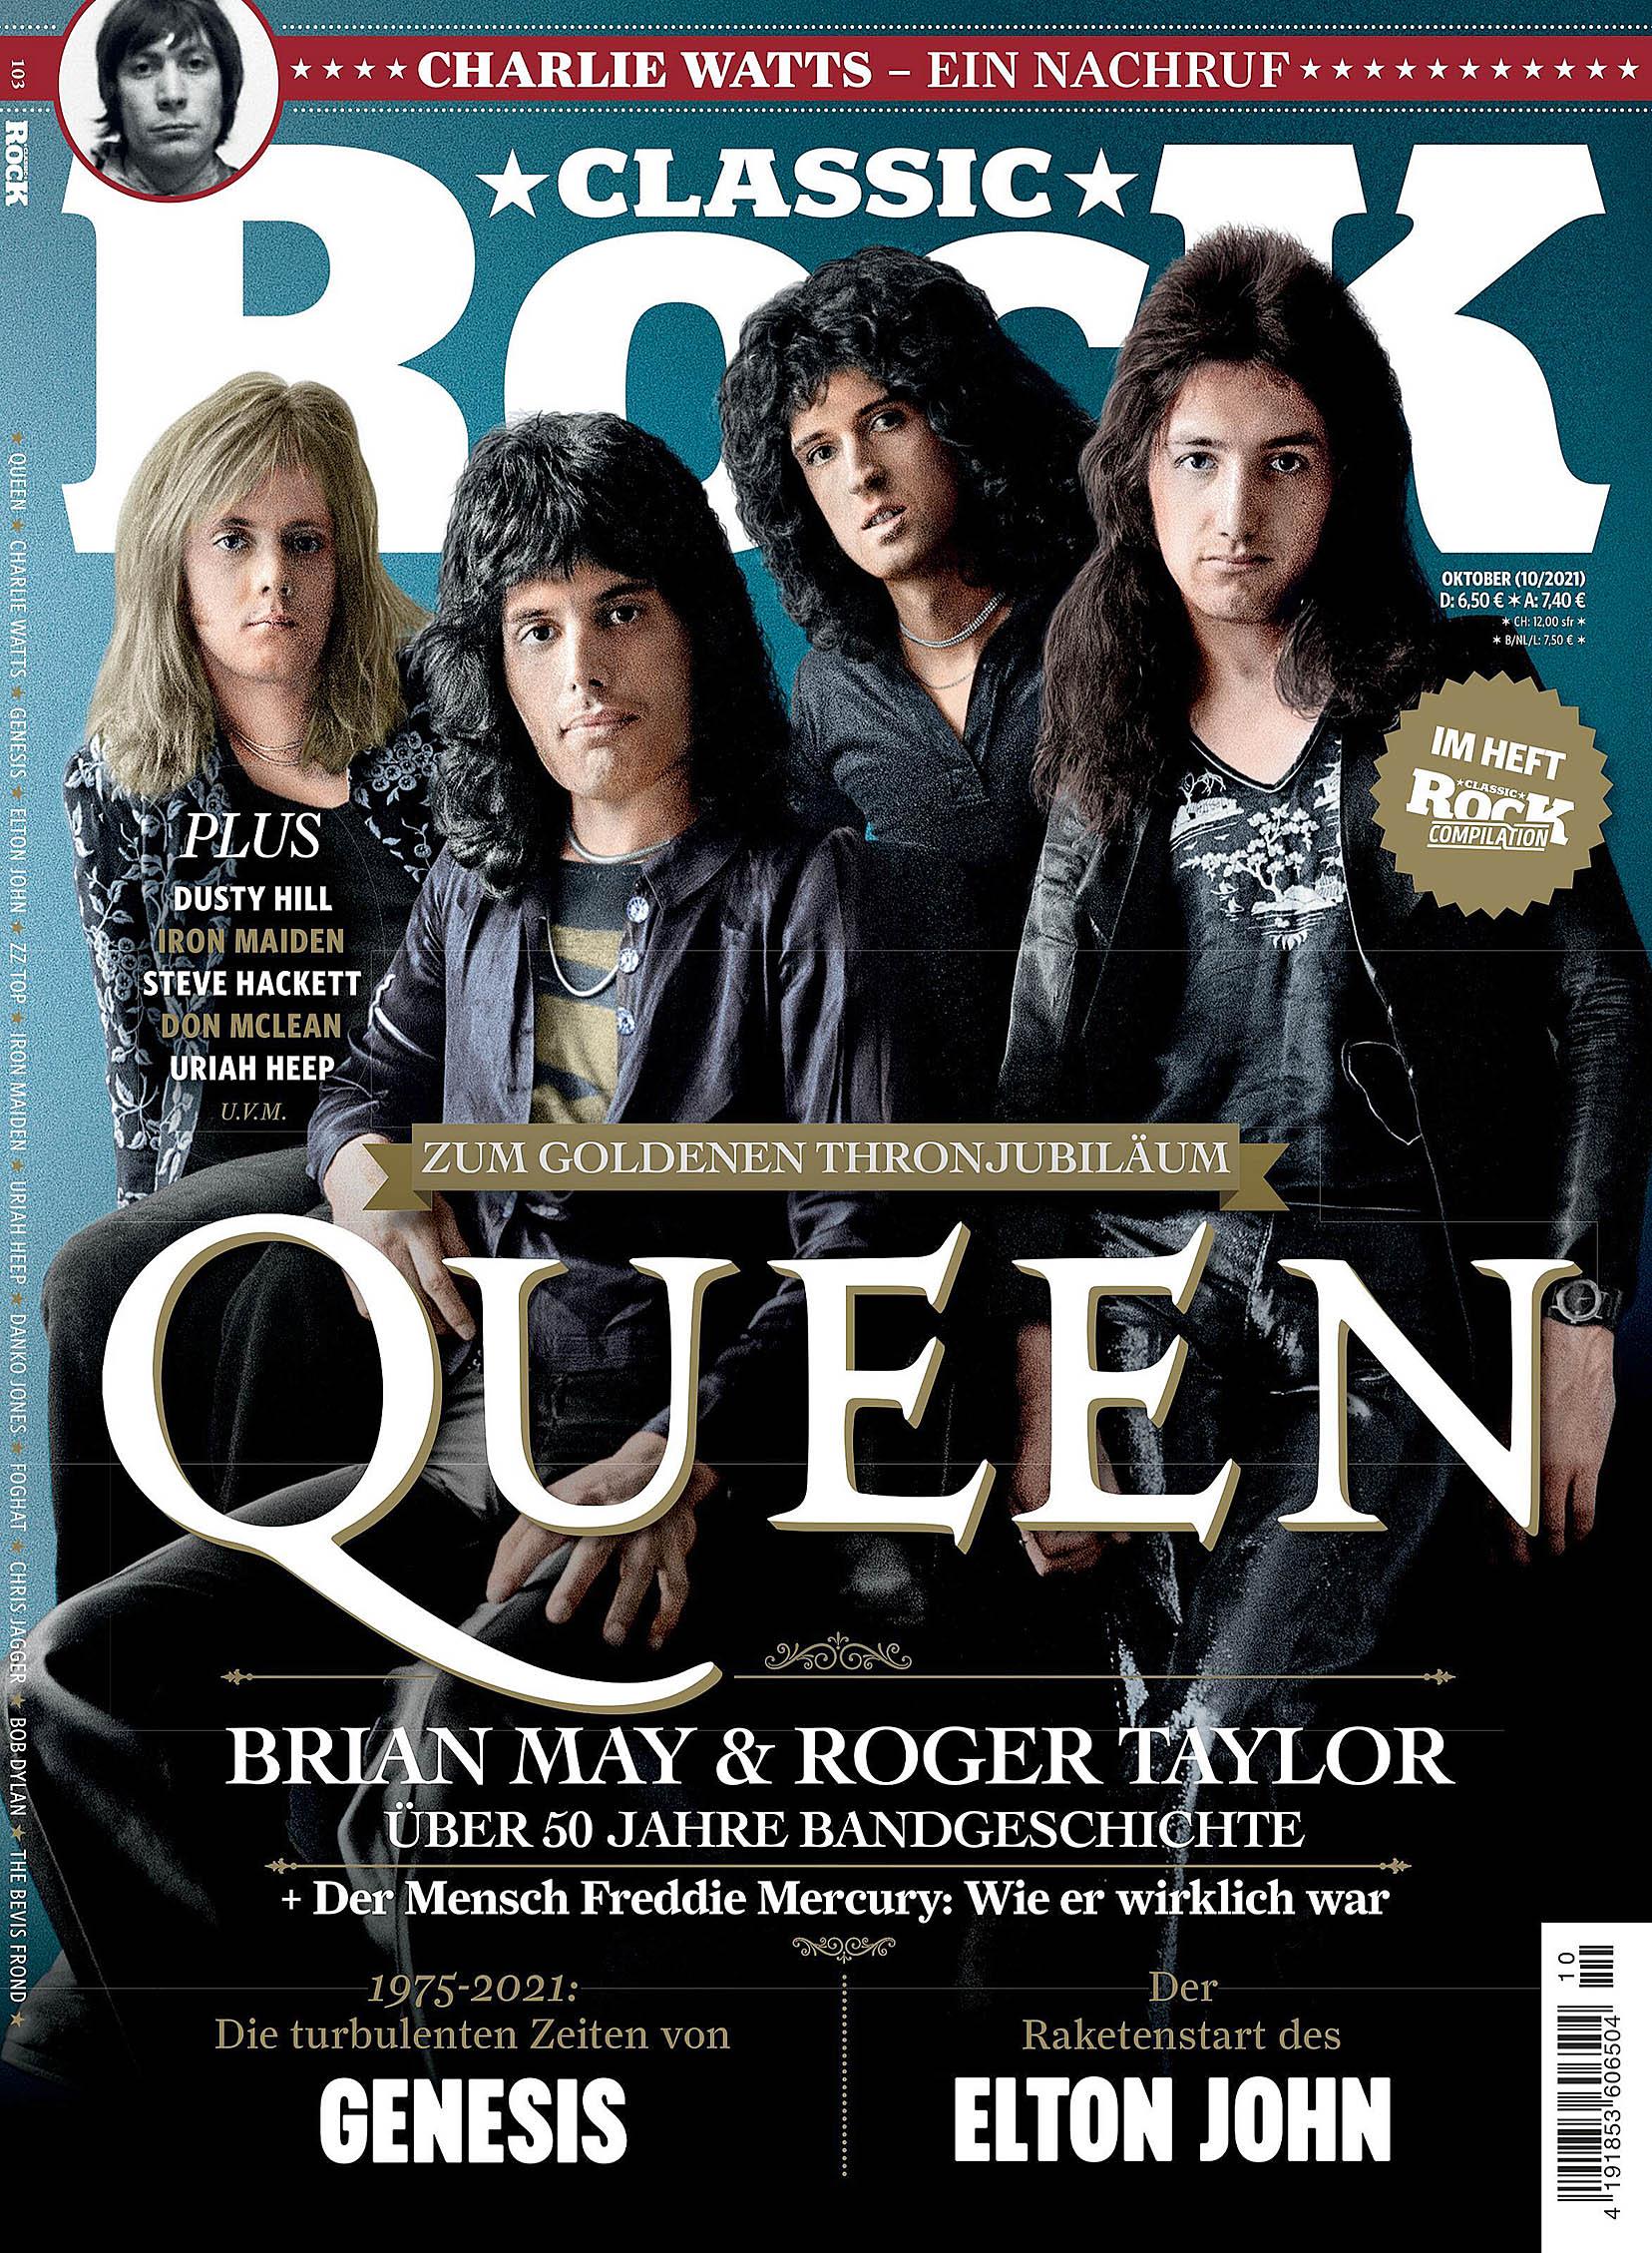 Classic Rock Ger 2021-10.jpg